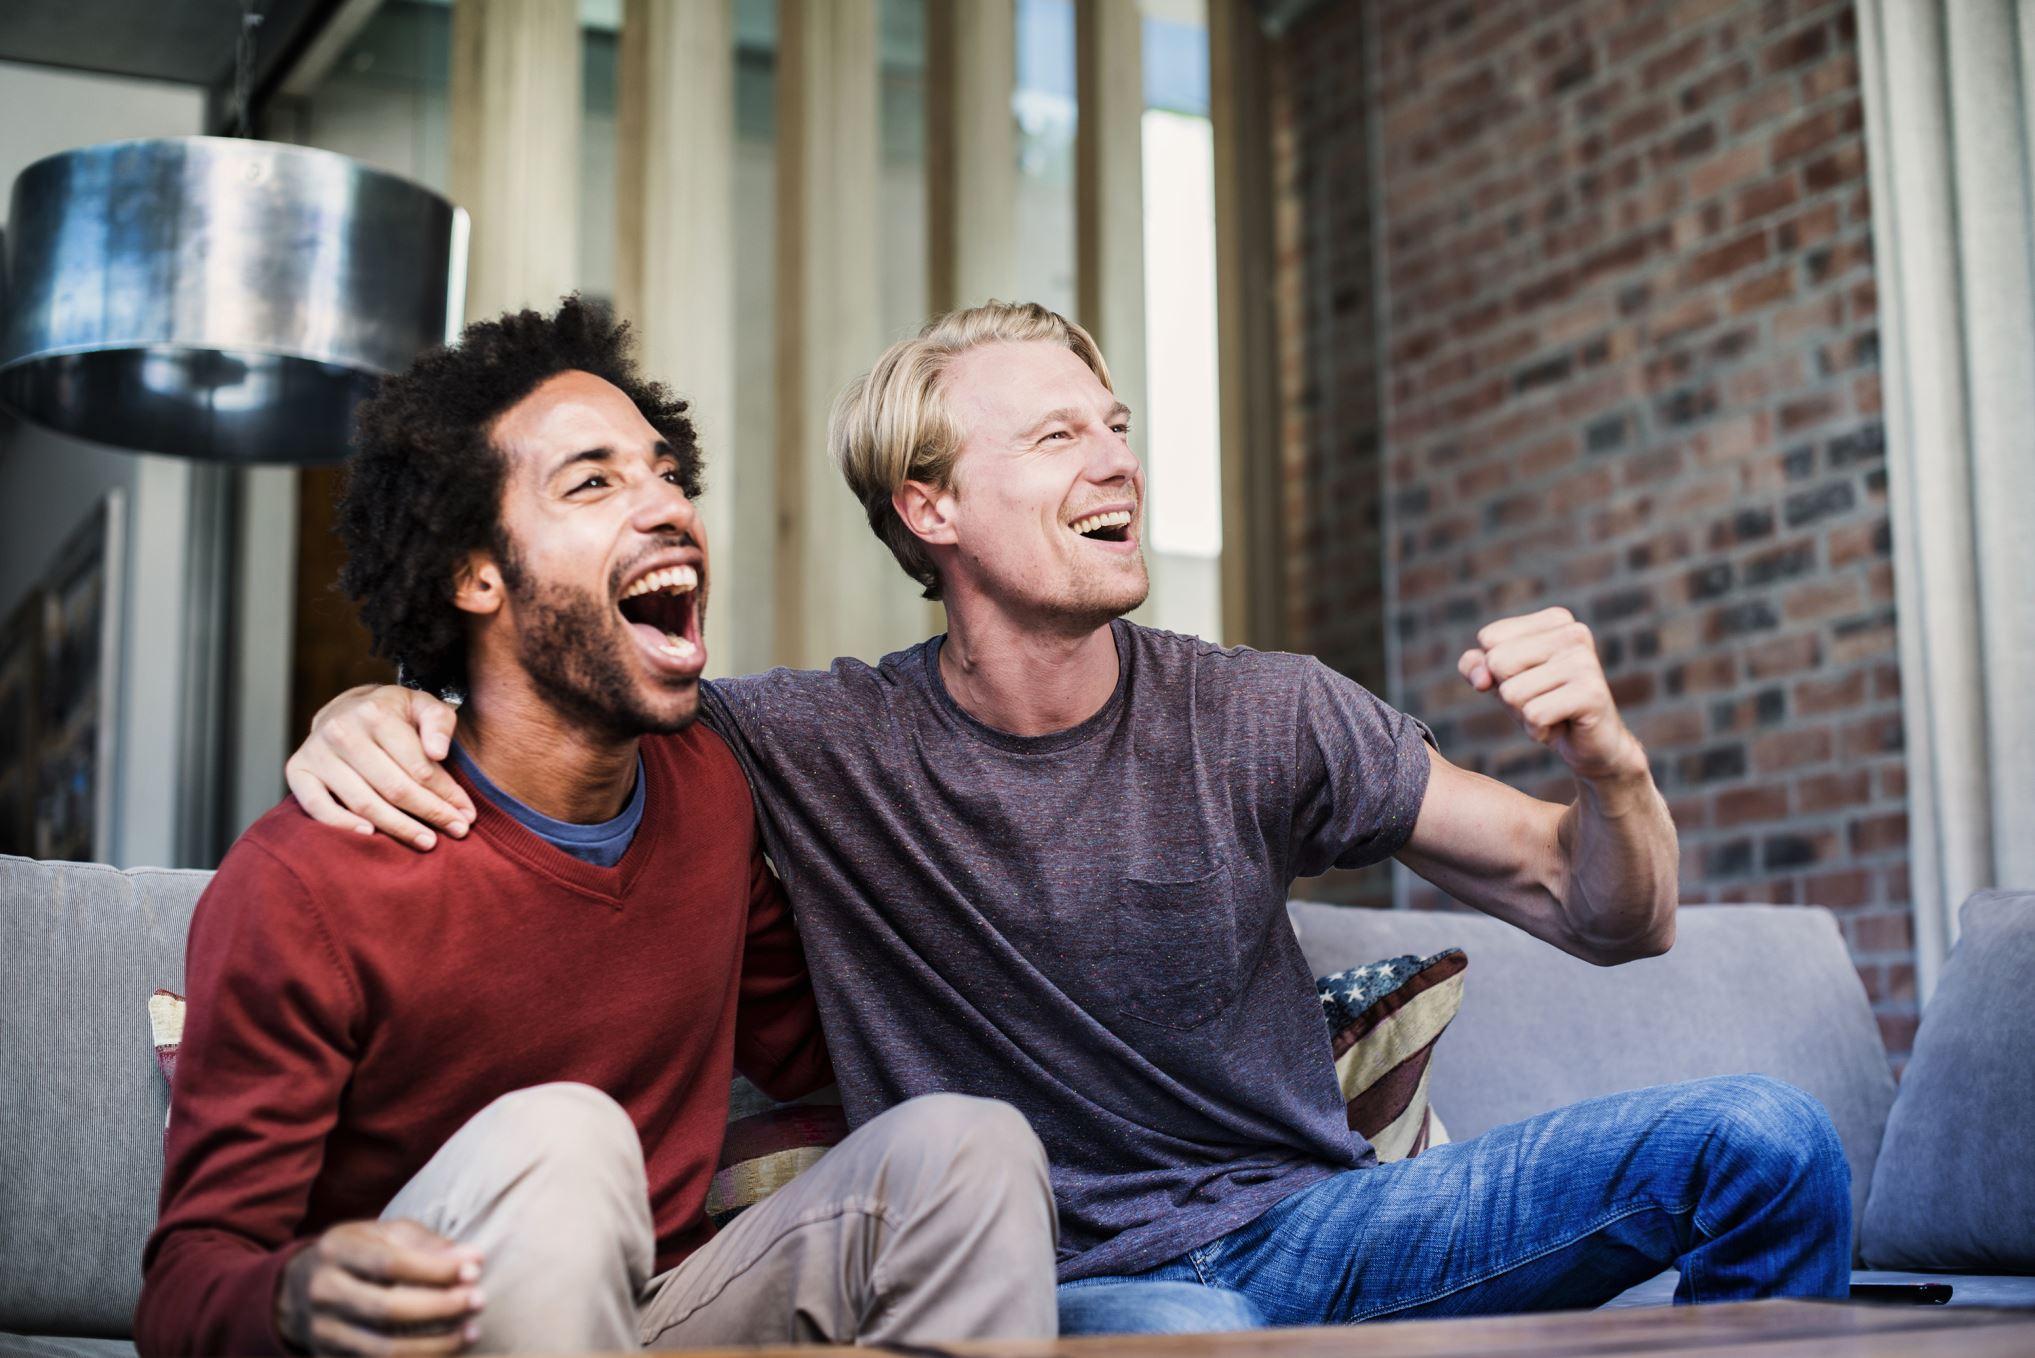 Men friends cheering sports team on tv